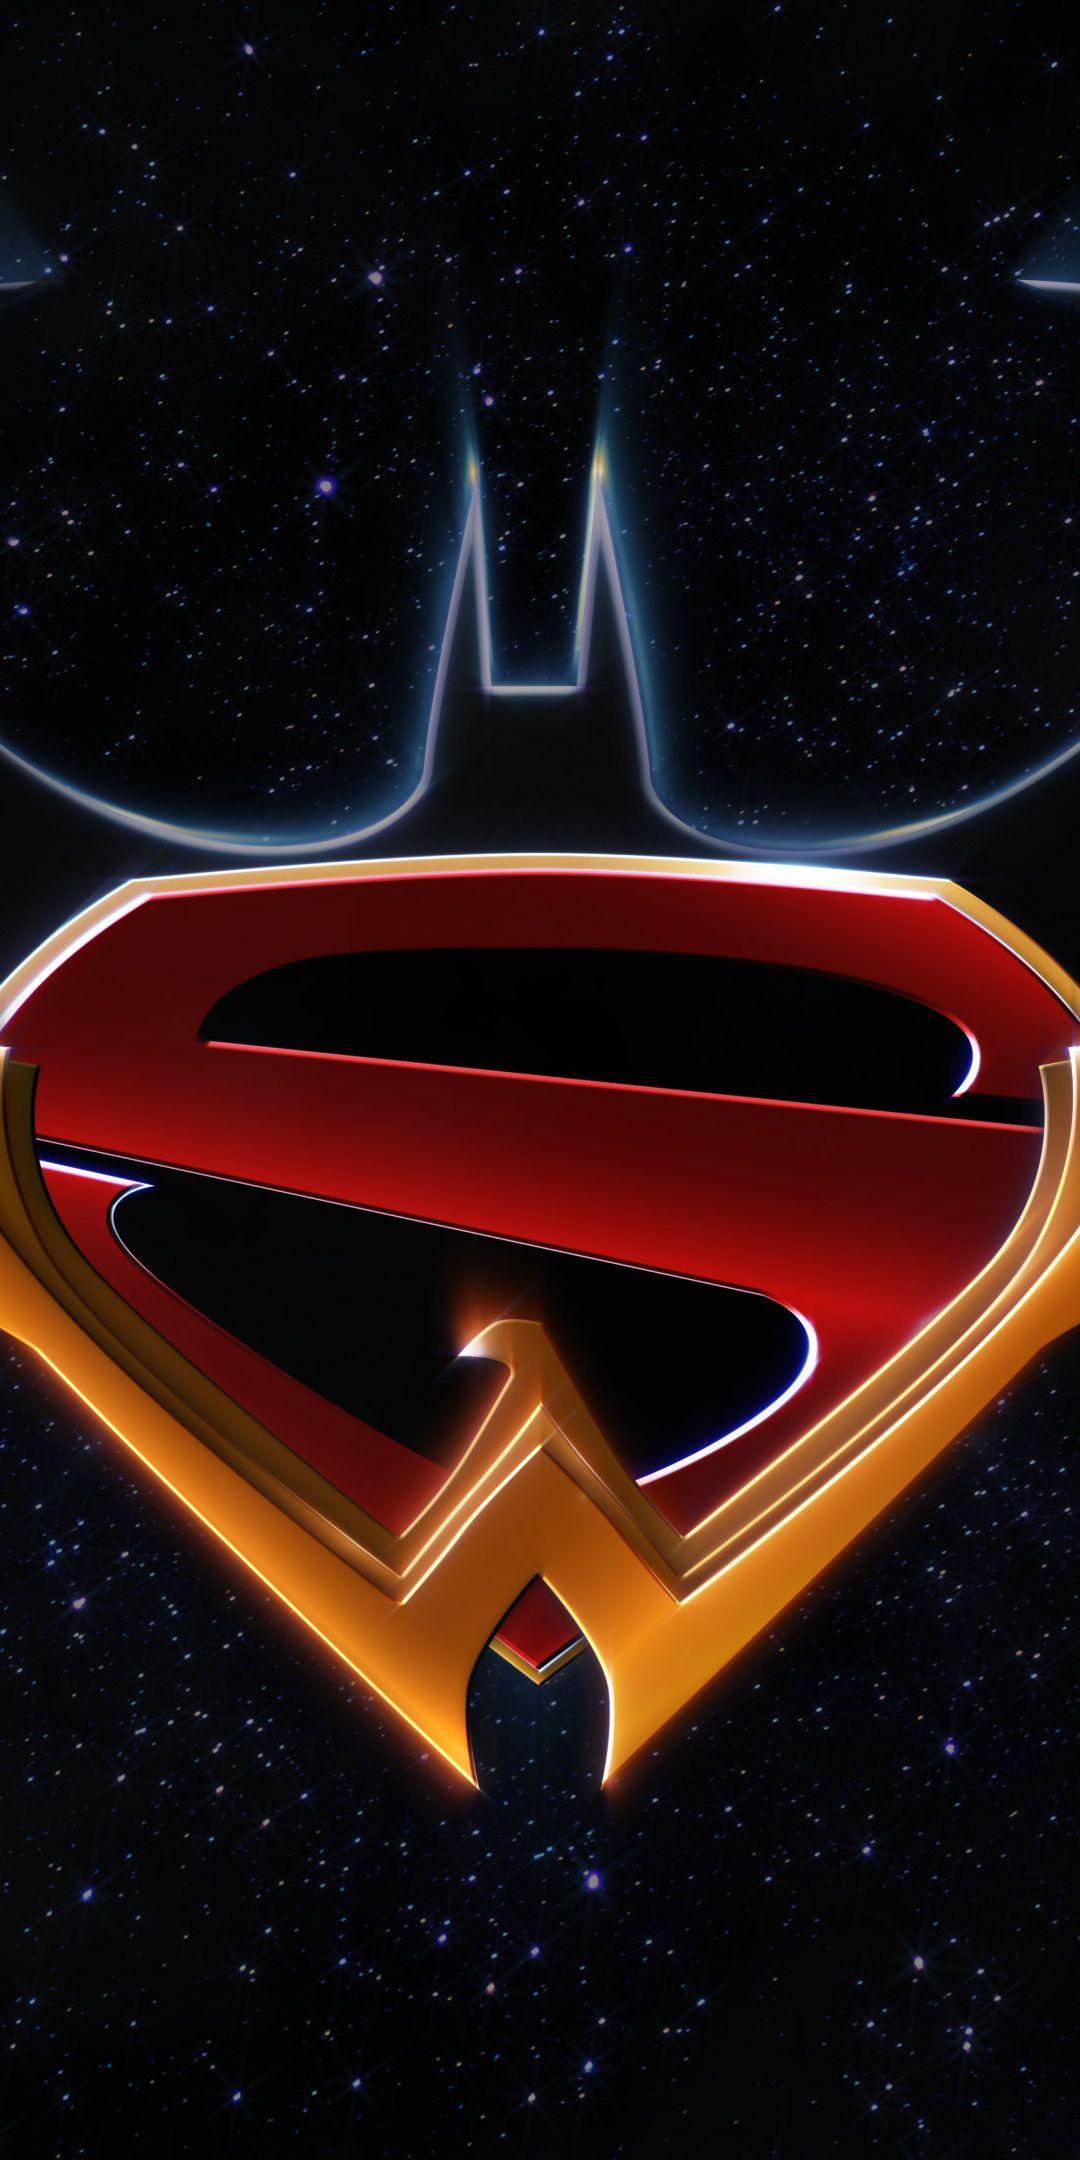 Logo Dark Batman Superman Wonder Woman Dc Comics Superheroes 1080x2160 Wallpaper Batman Wallpaper Dc Comics Wallpaper Superhero Wallpaper